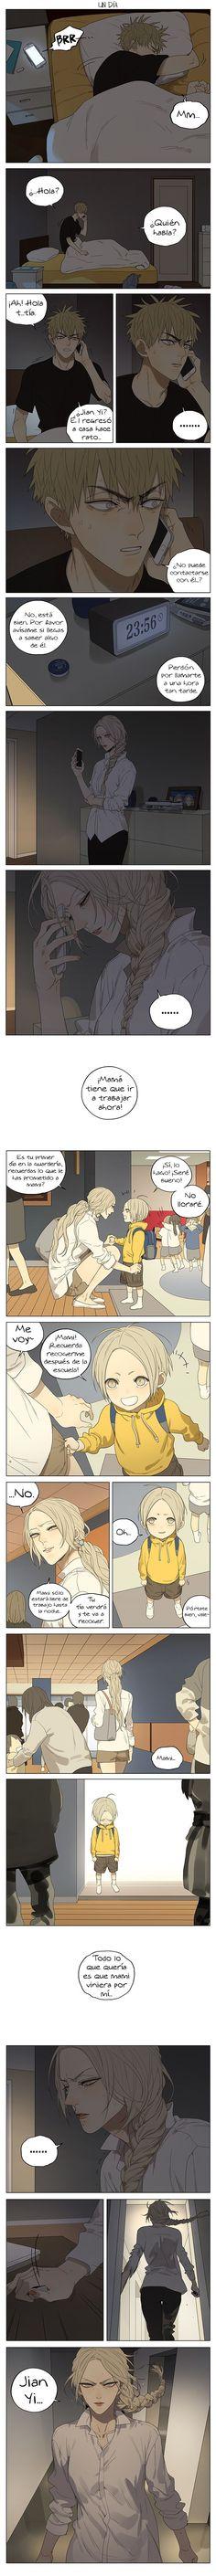 19 Days Capítulo 192 página 1 - Leer Manga en Español gratis en NineManga.com